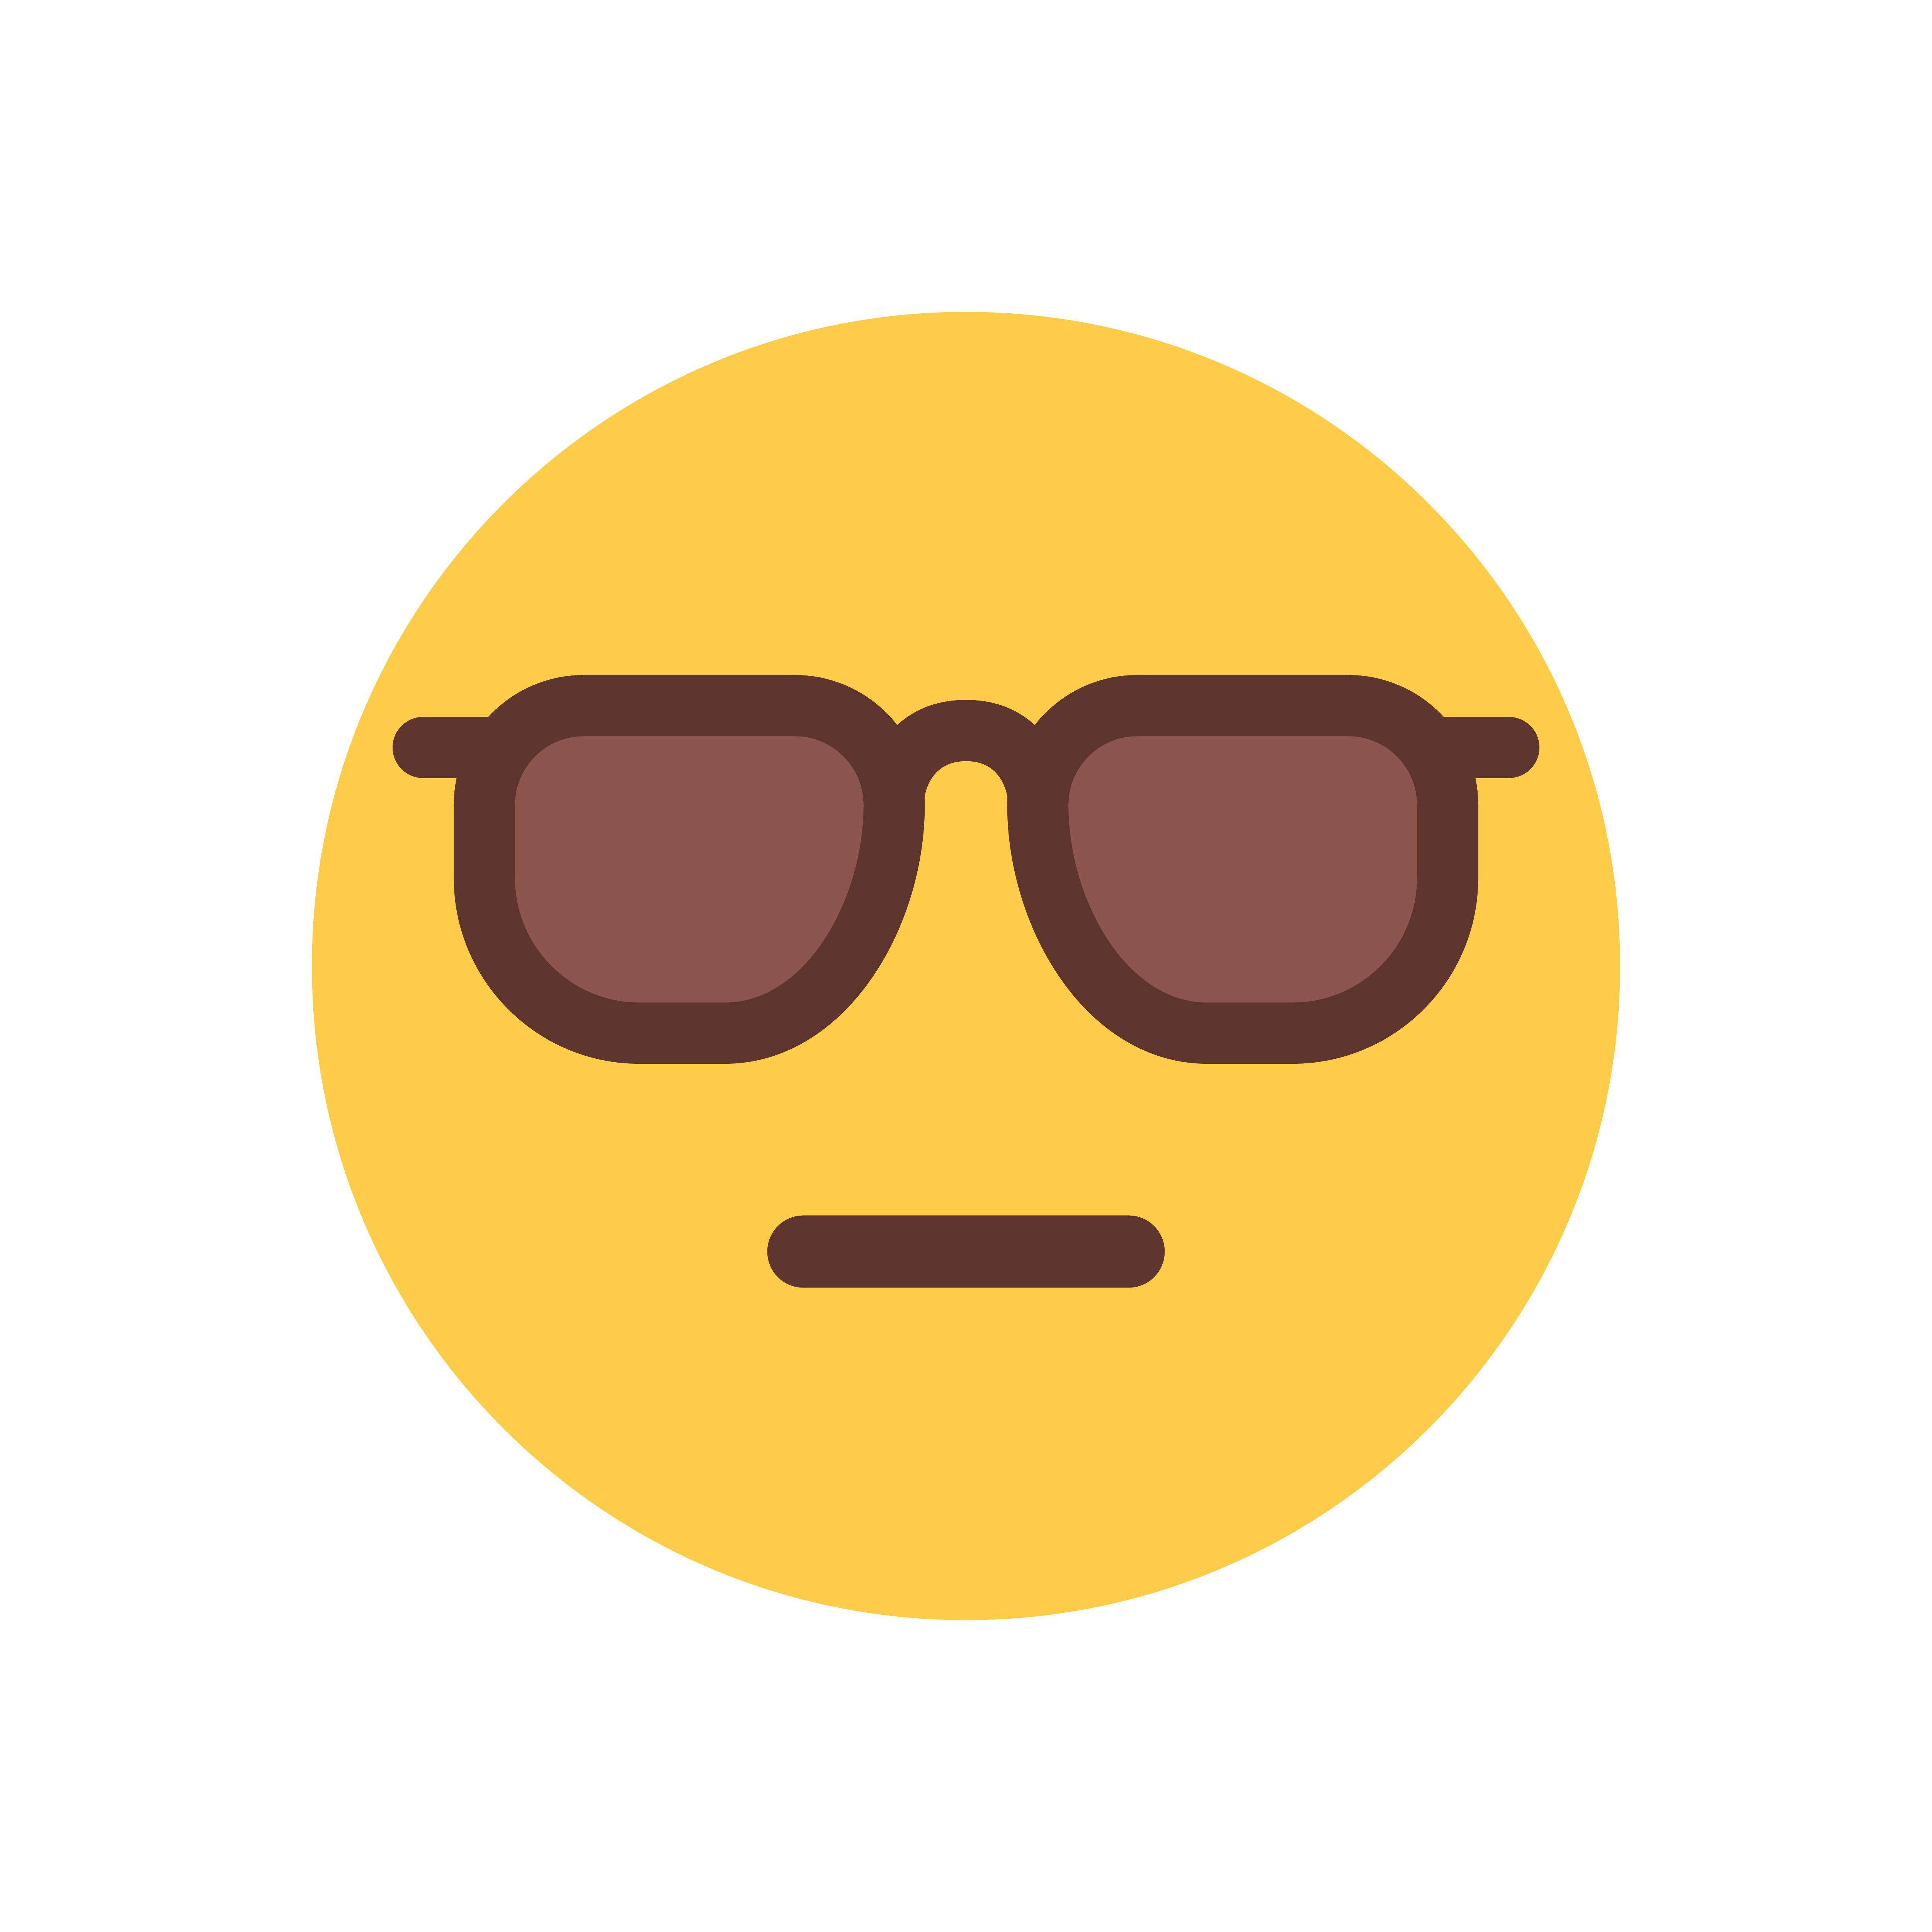 solbrille, emoji, smiley, smojis